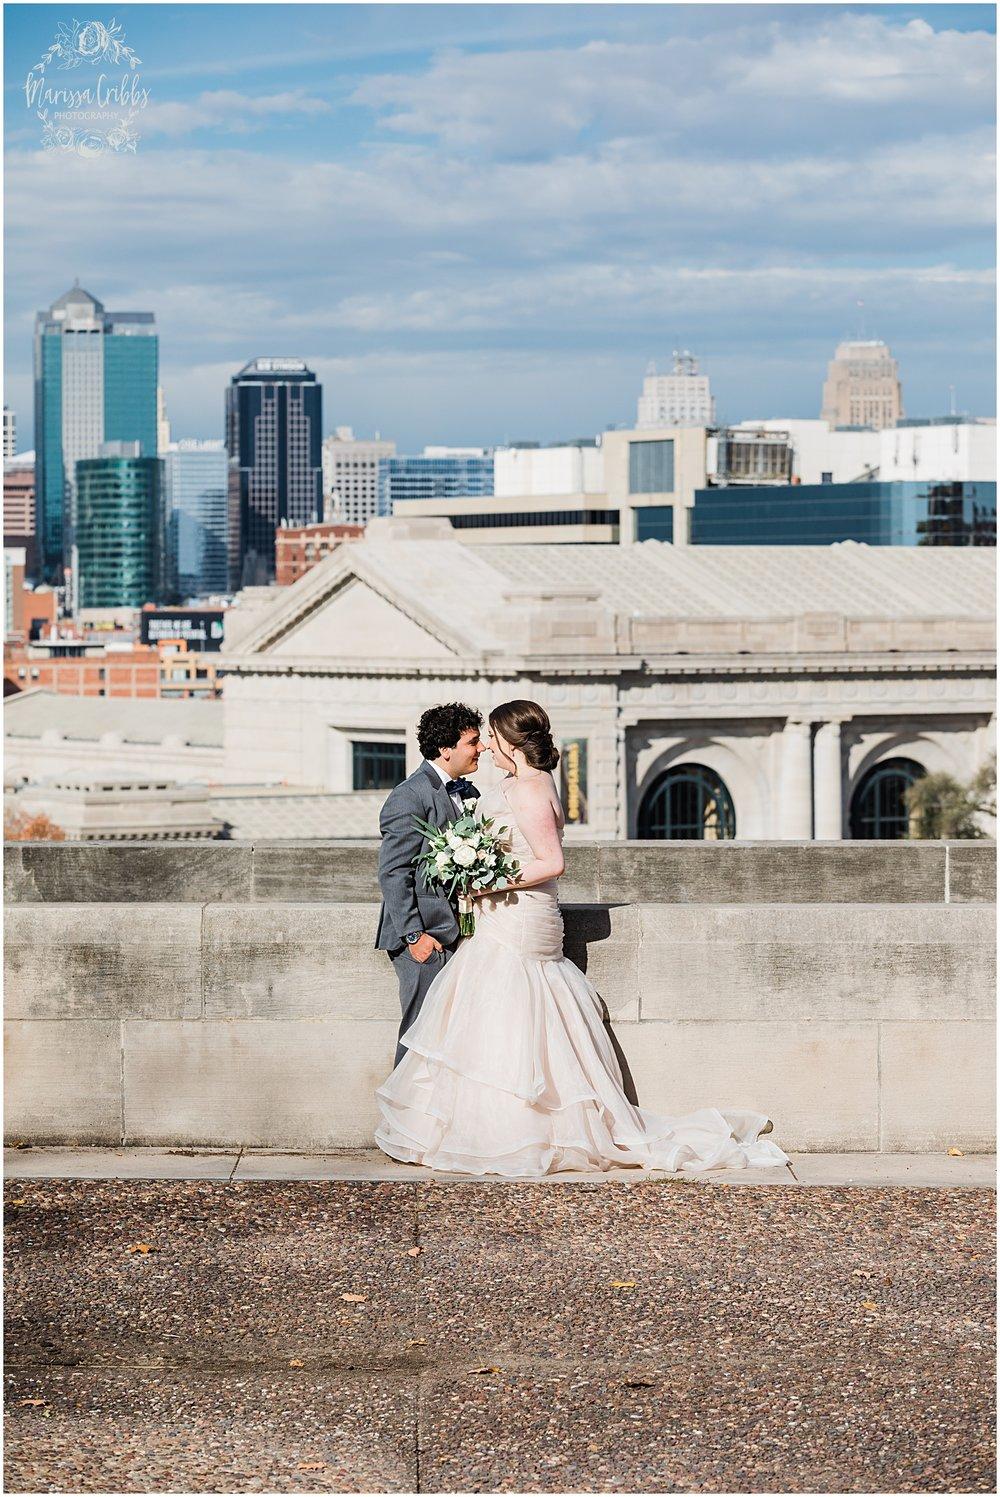 JULIA & AUSTIN MADRID THEATRE WEDDING | MARISSA CRIBBS PHOTOGRAPHY_7107.jpg